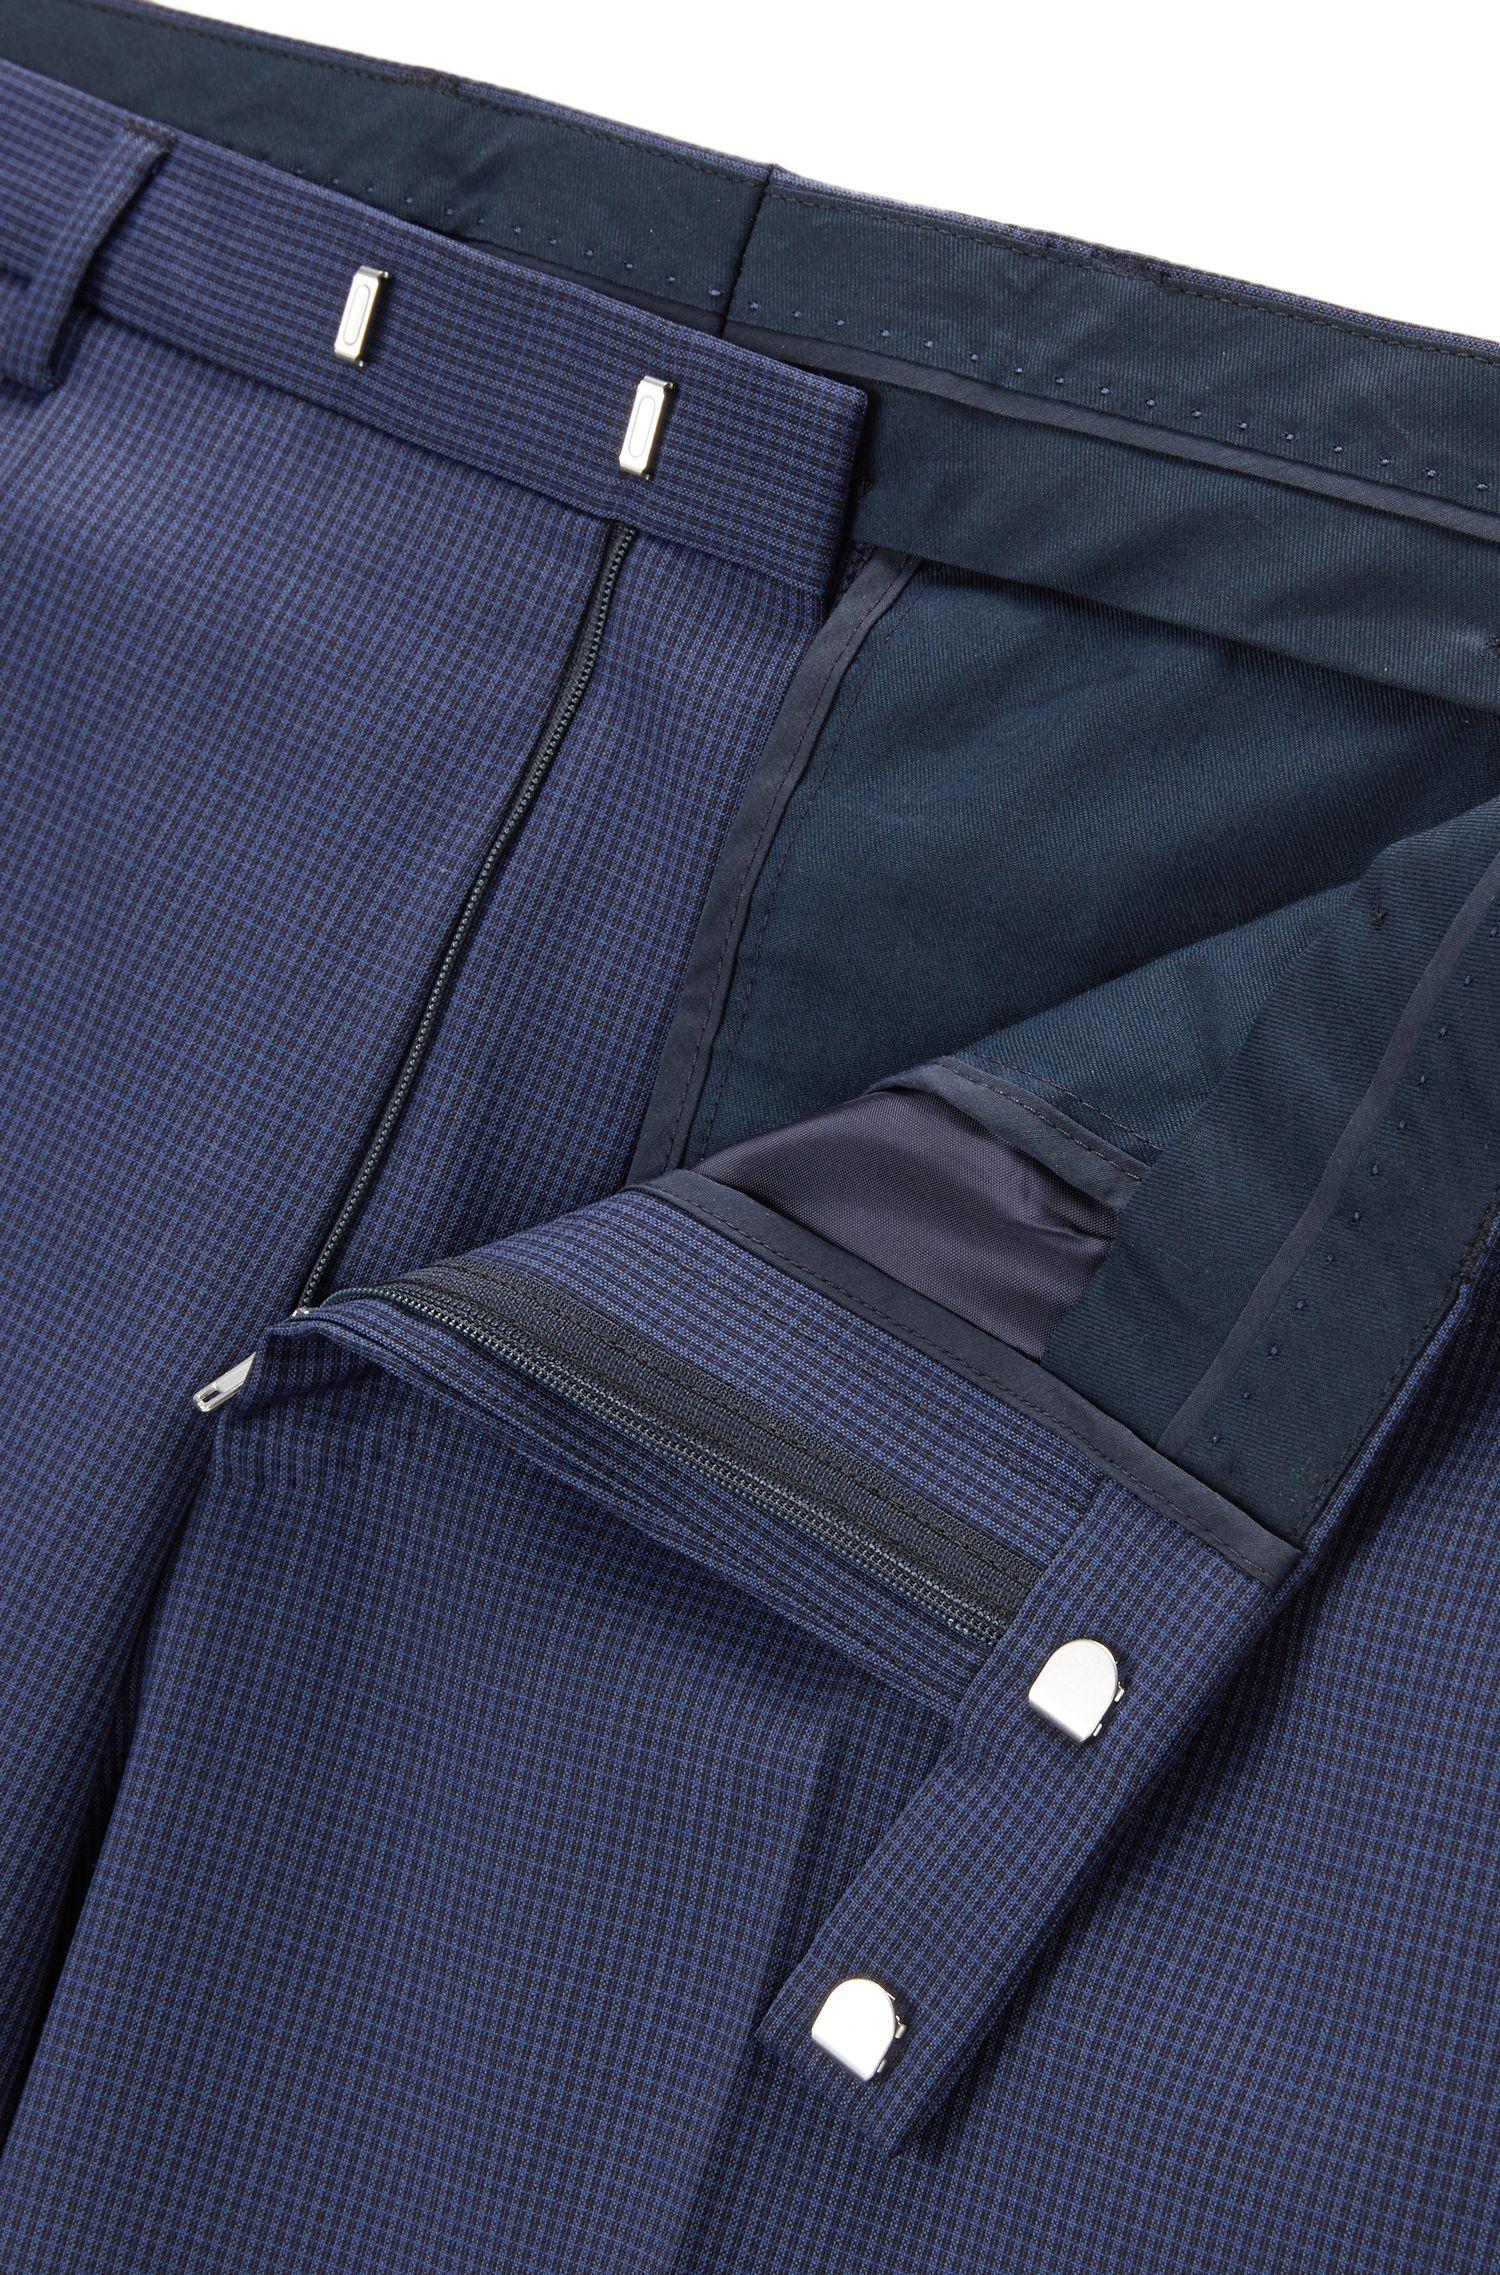 Virgin Wool 3-Piece Suit, Regular Fit | Jerron/Lenon WE, Blue